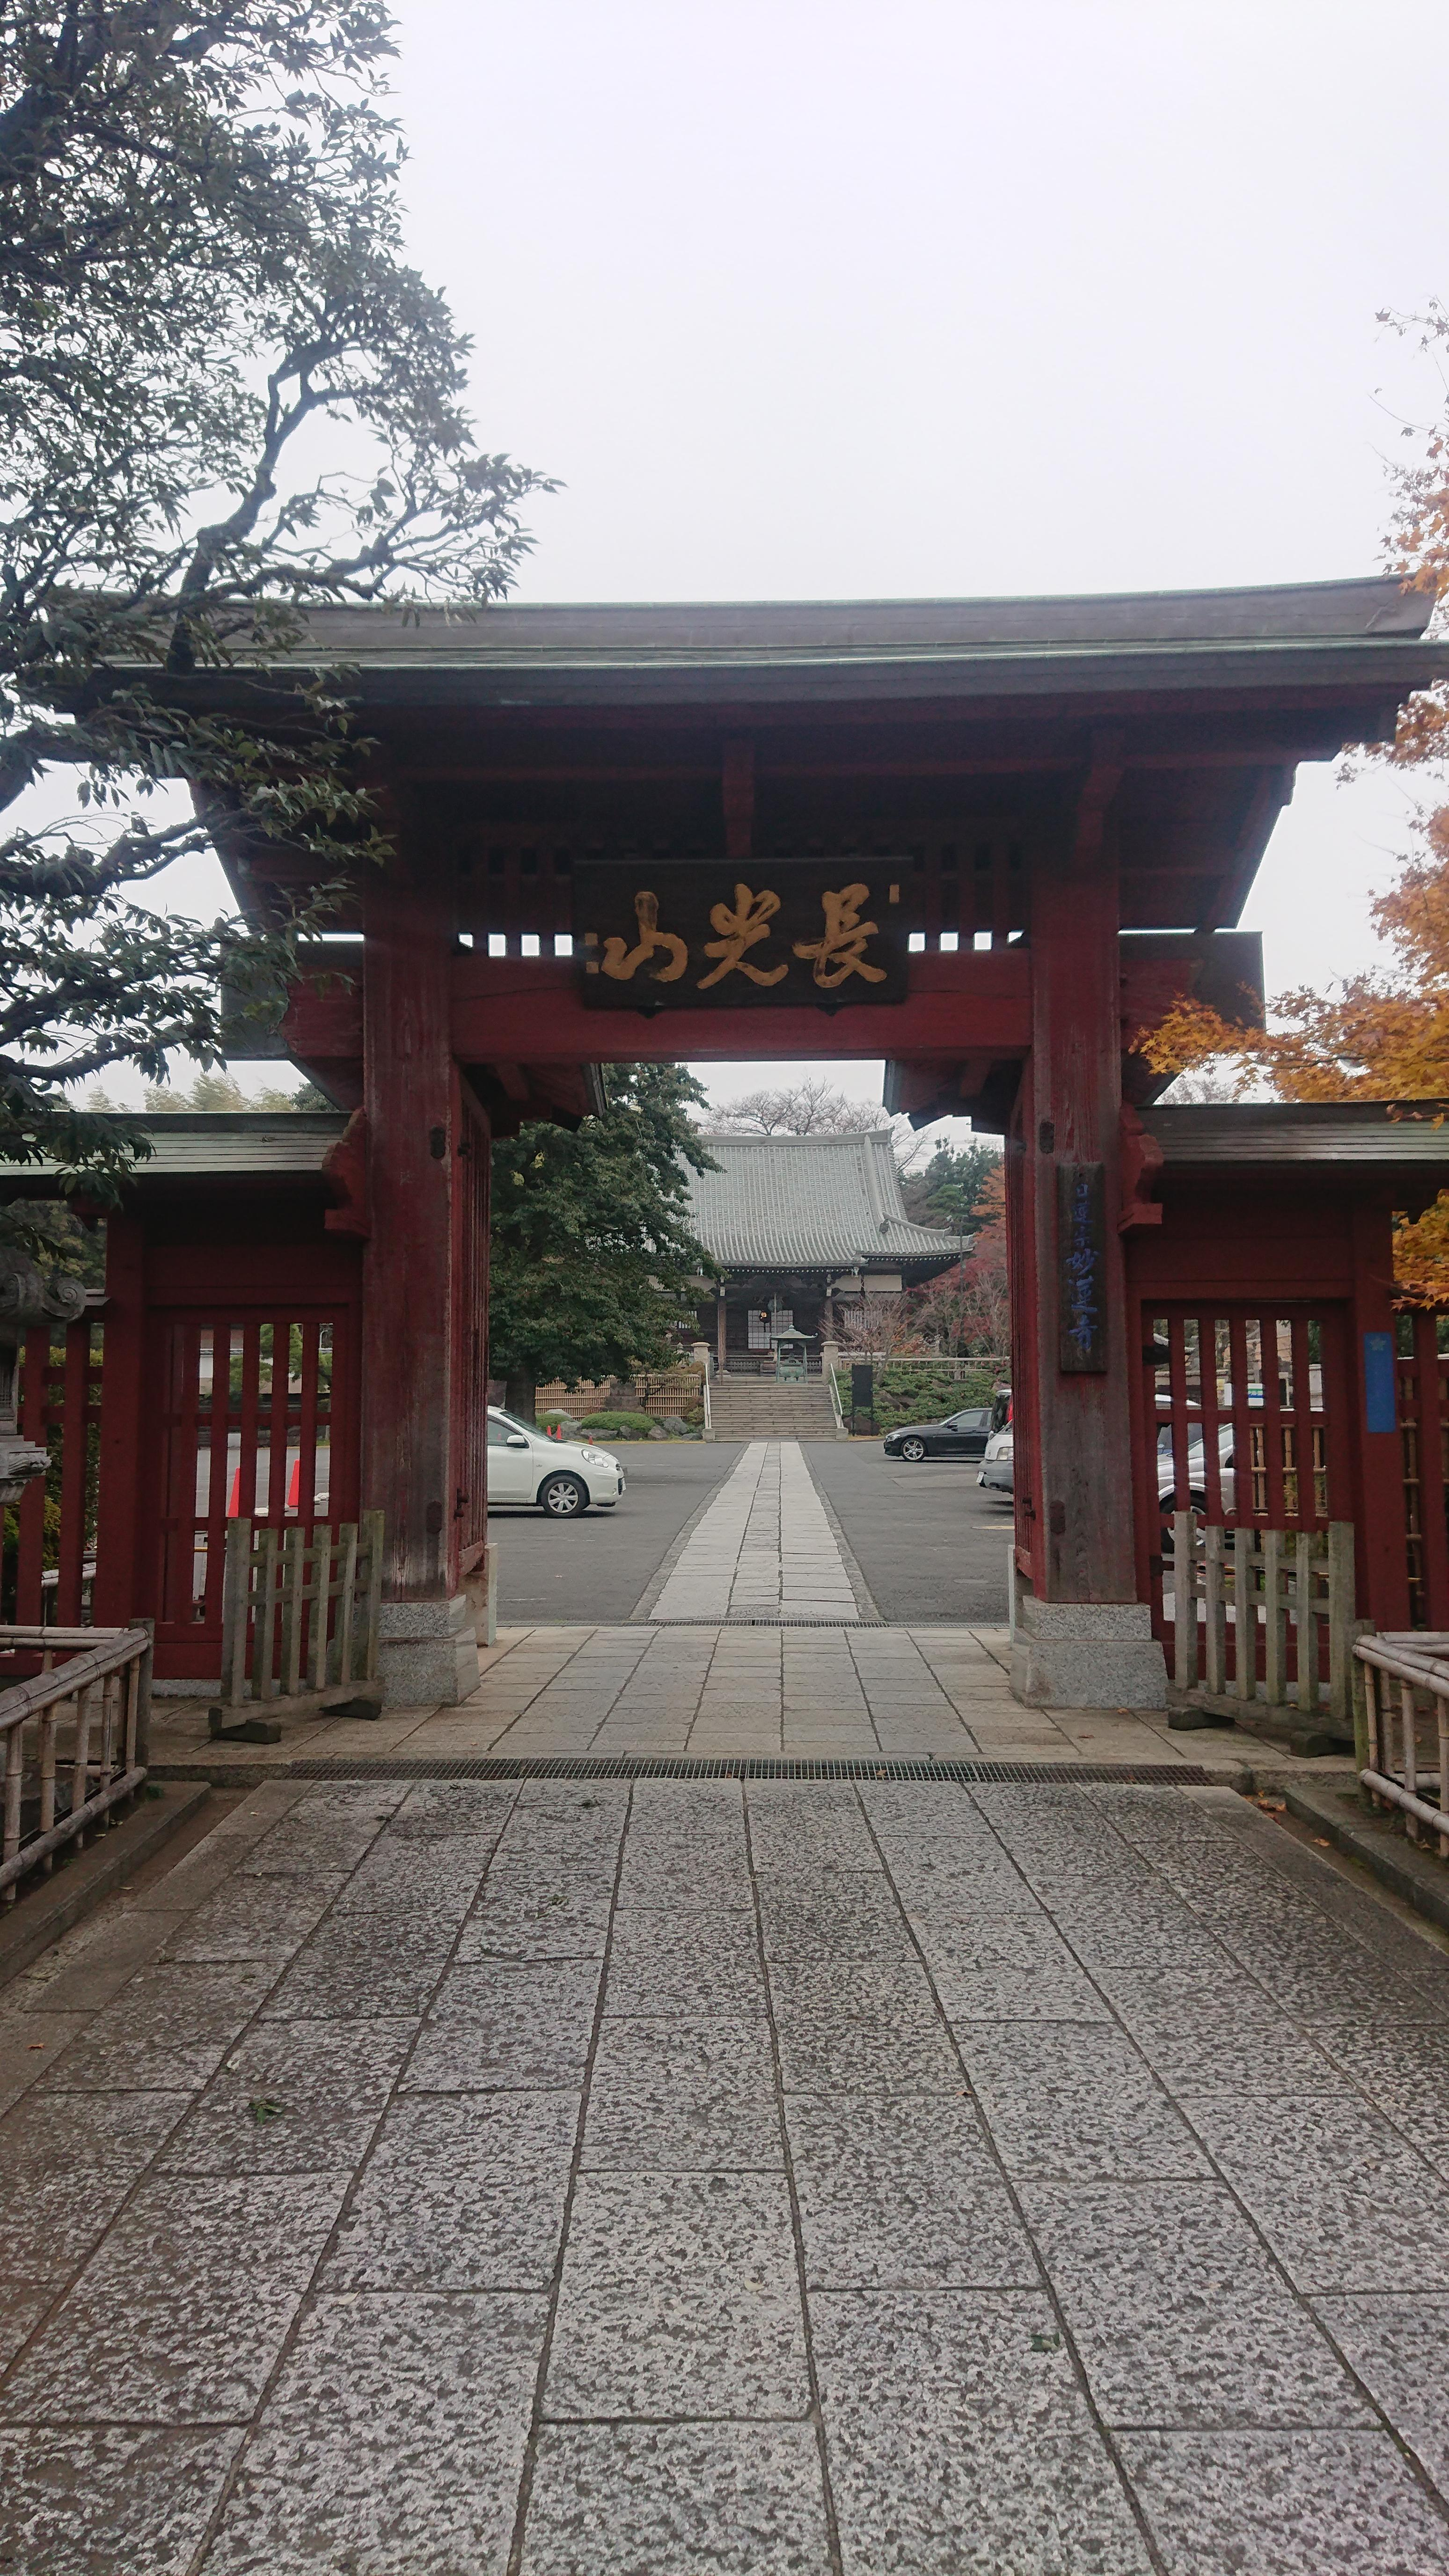 妙蓮寺の境内・文化財